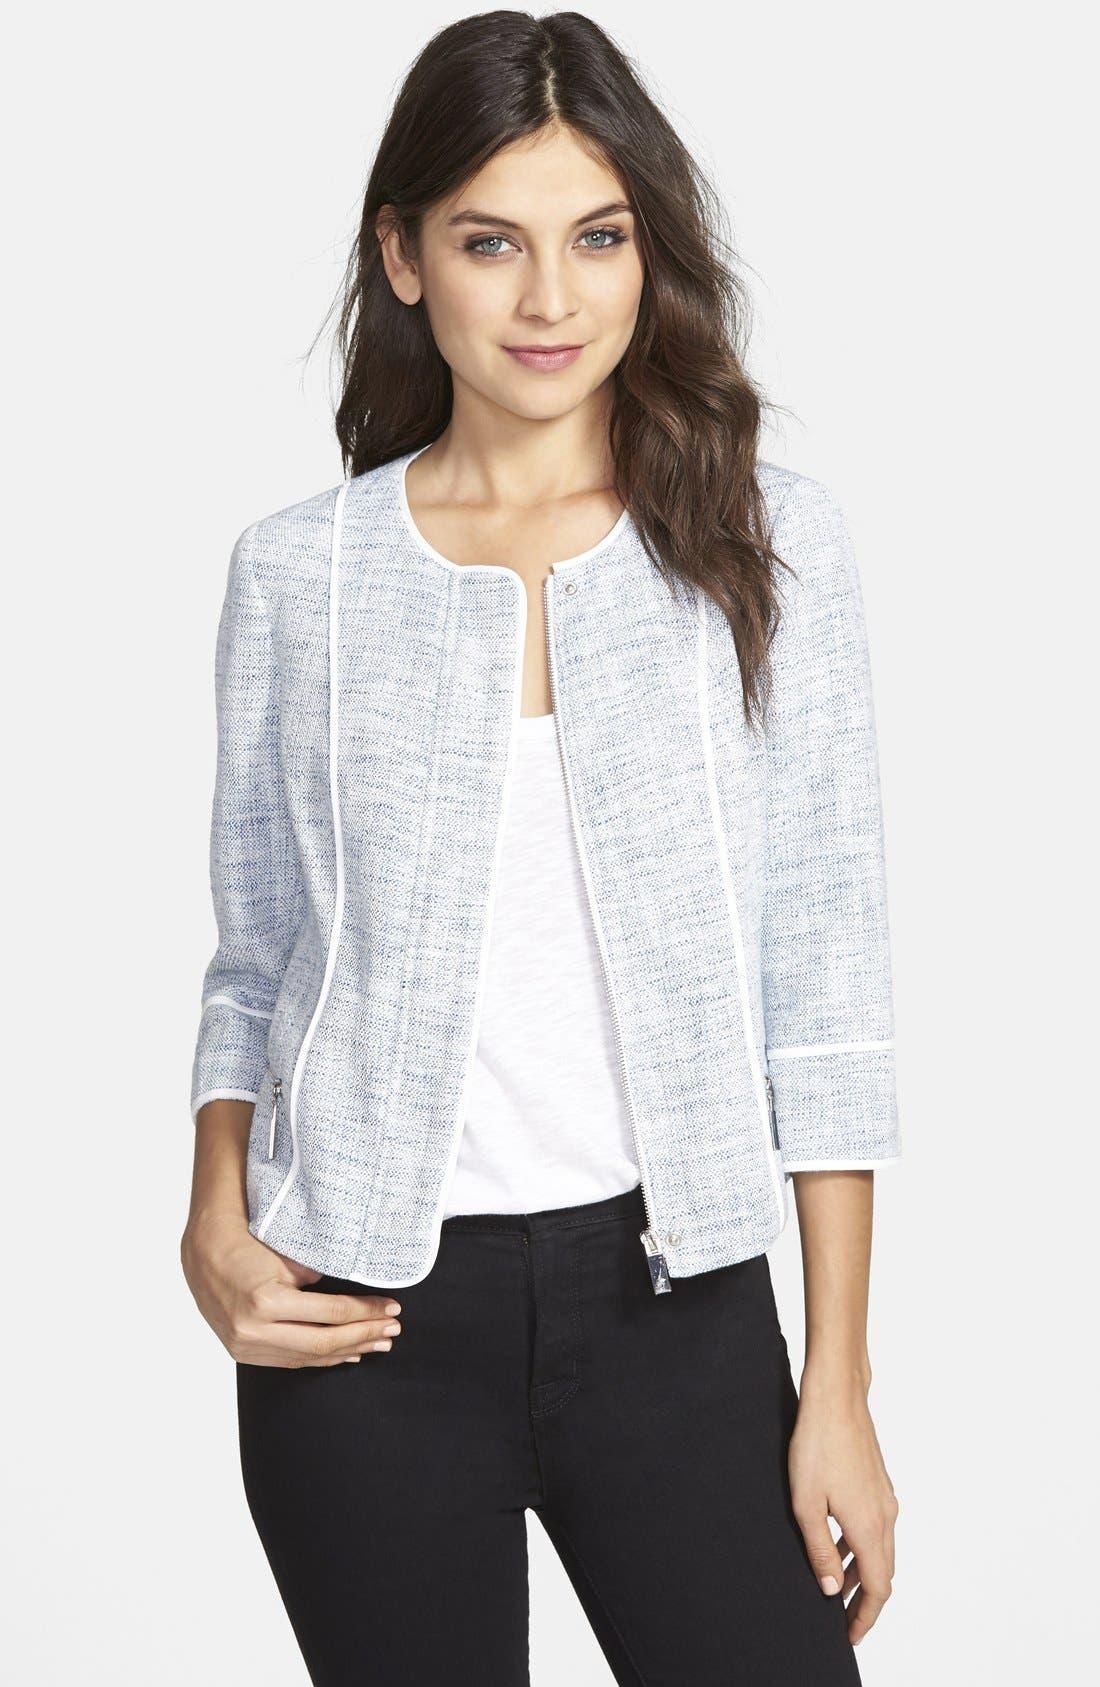 Alternate Image 1 Selected - Vince Camuto Contrast Trim Collarless Tweed Jacket (Regular & Petite)